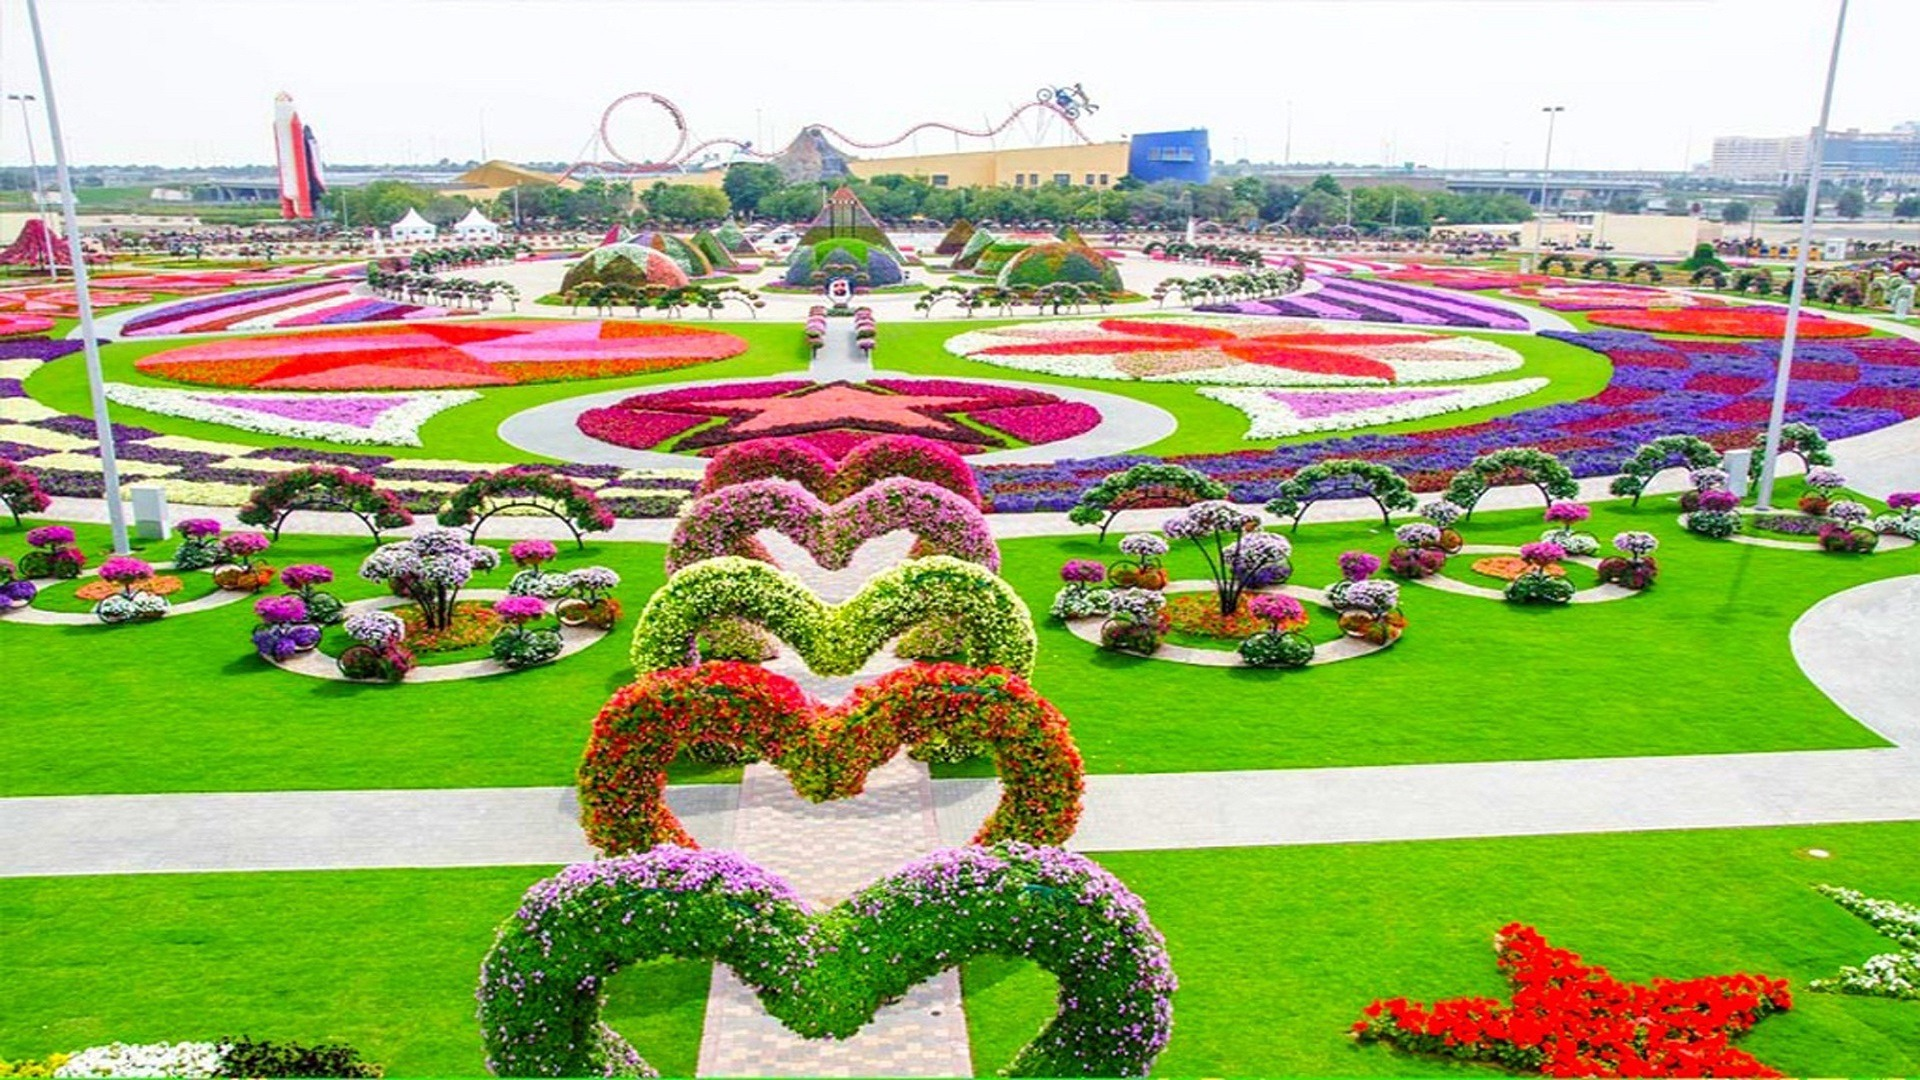 Theme park in Dubai